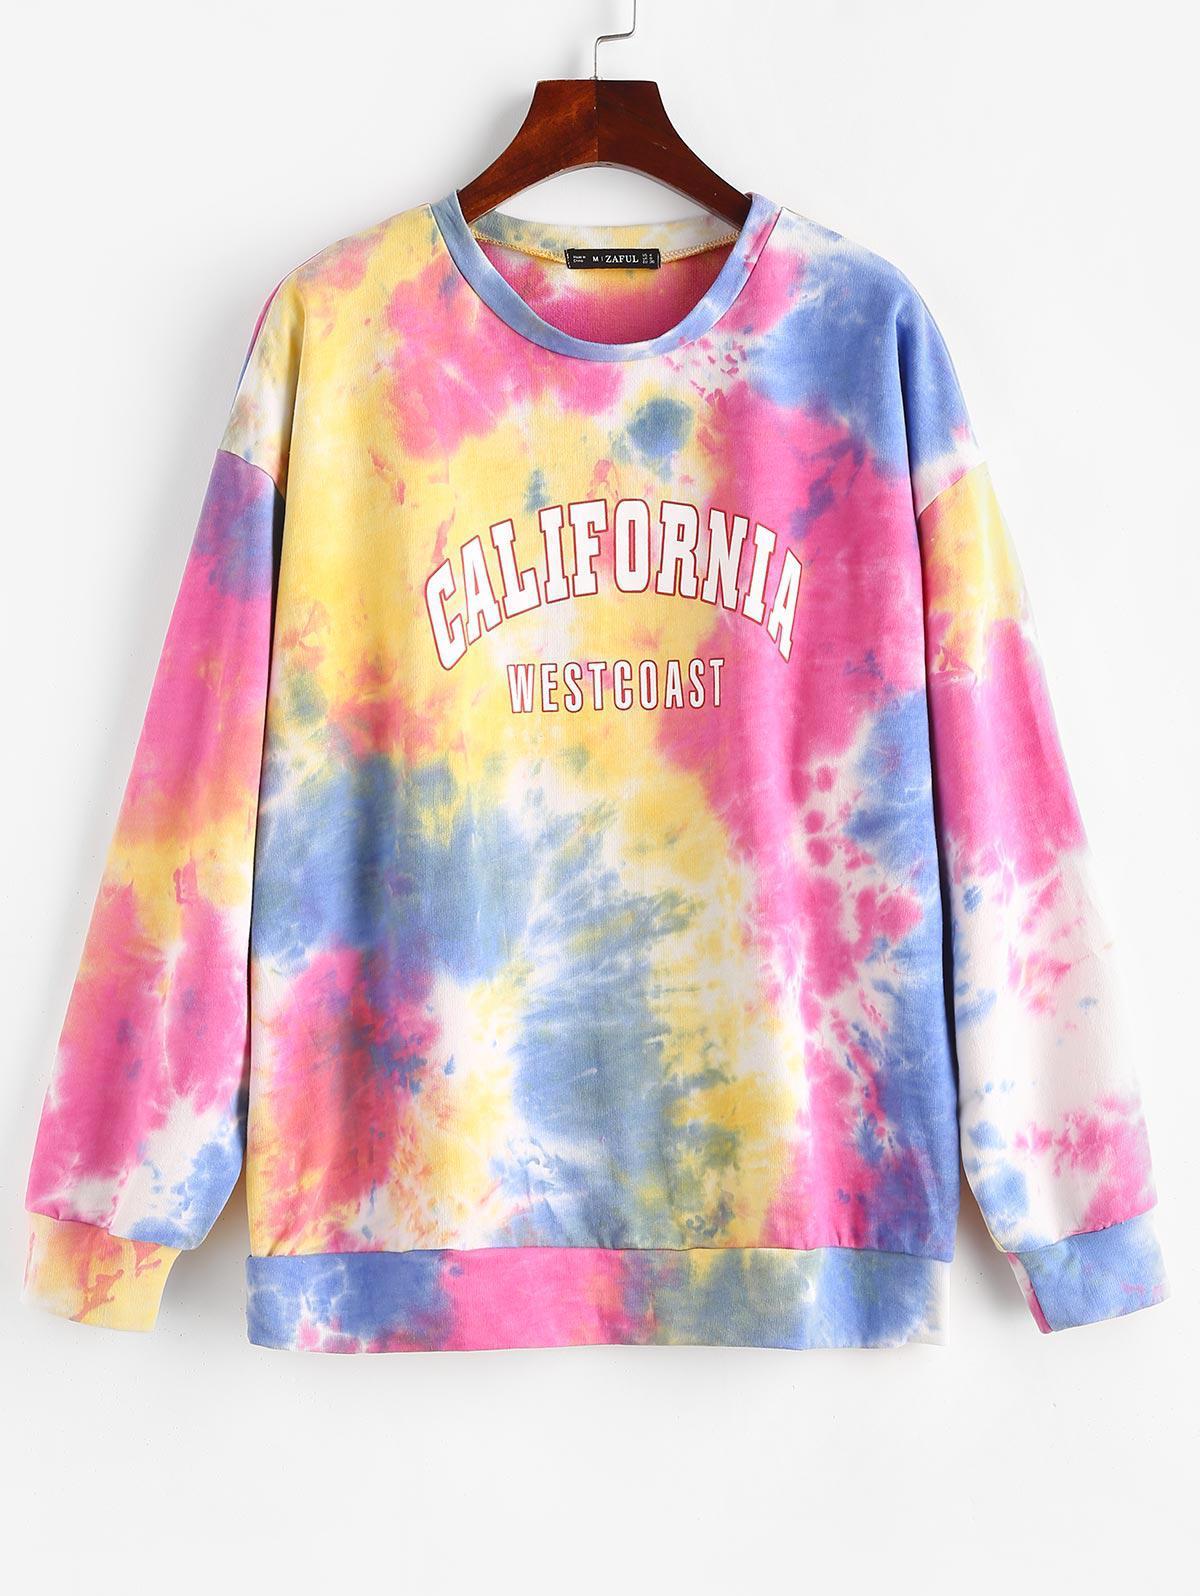 Colorful Tie Dye WEST COAST Graphic Sweatshirt